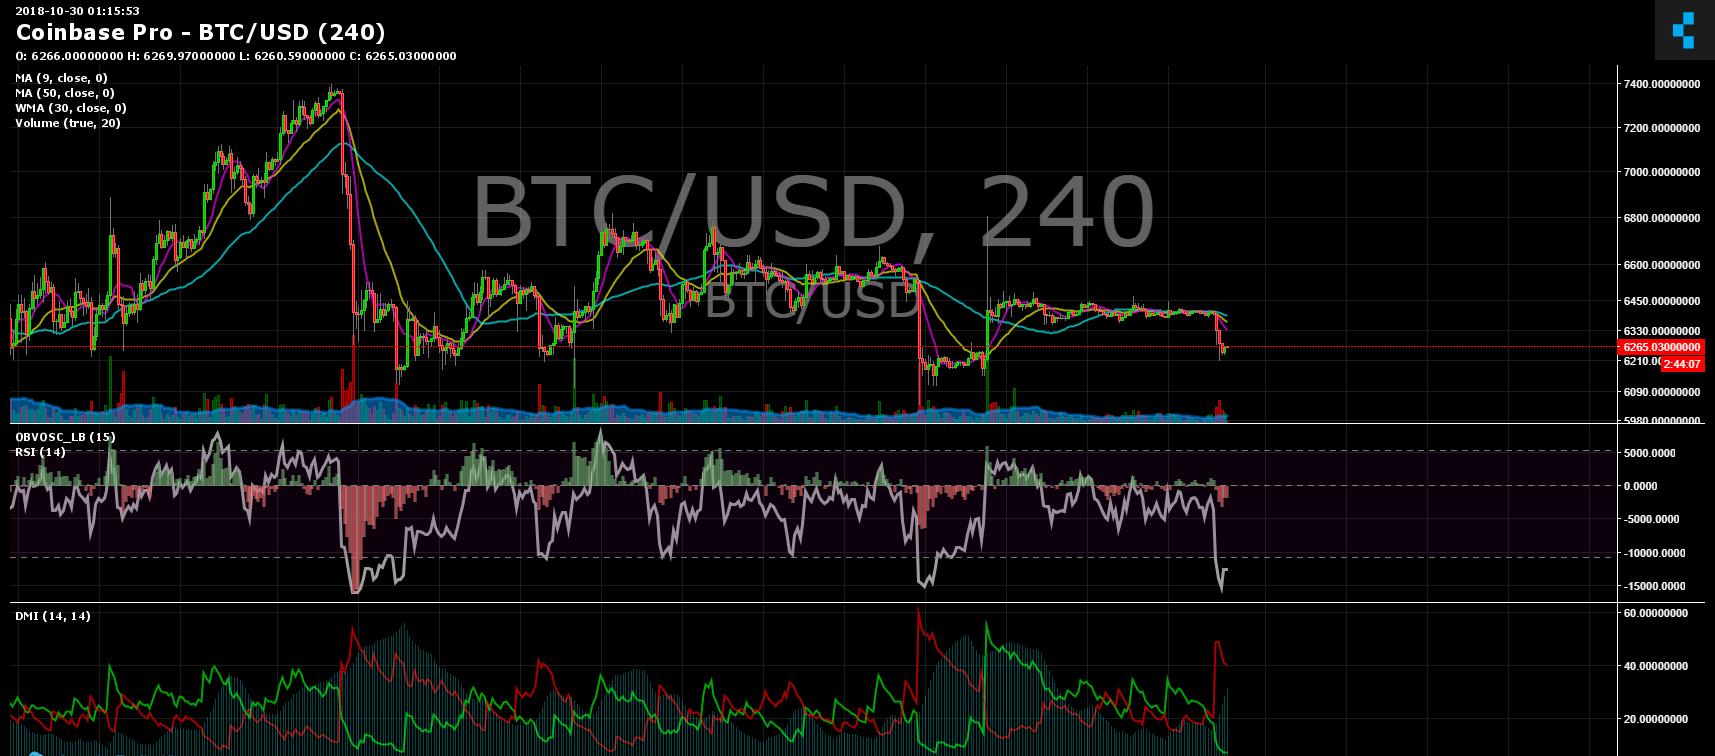 BTC/USD 240